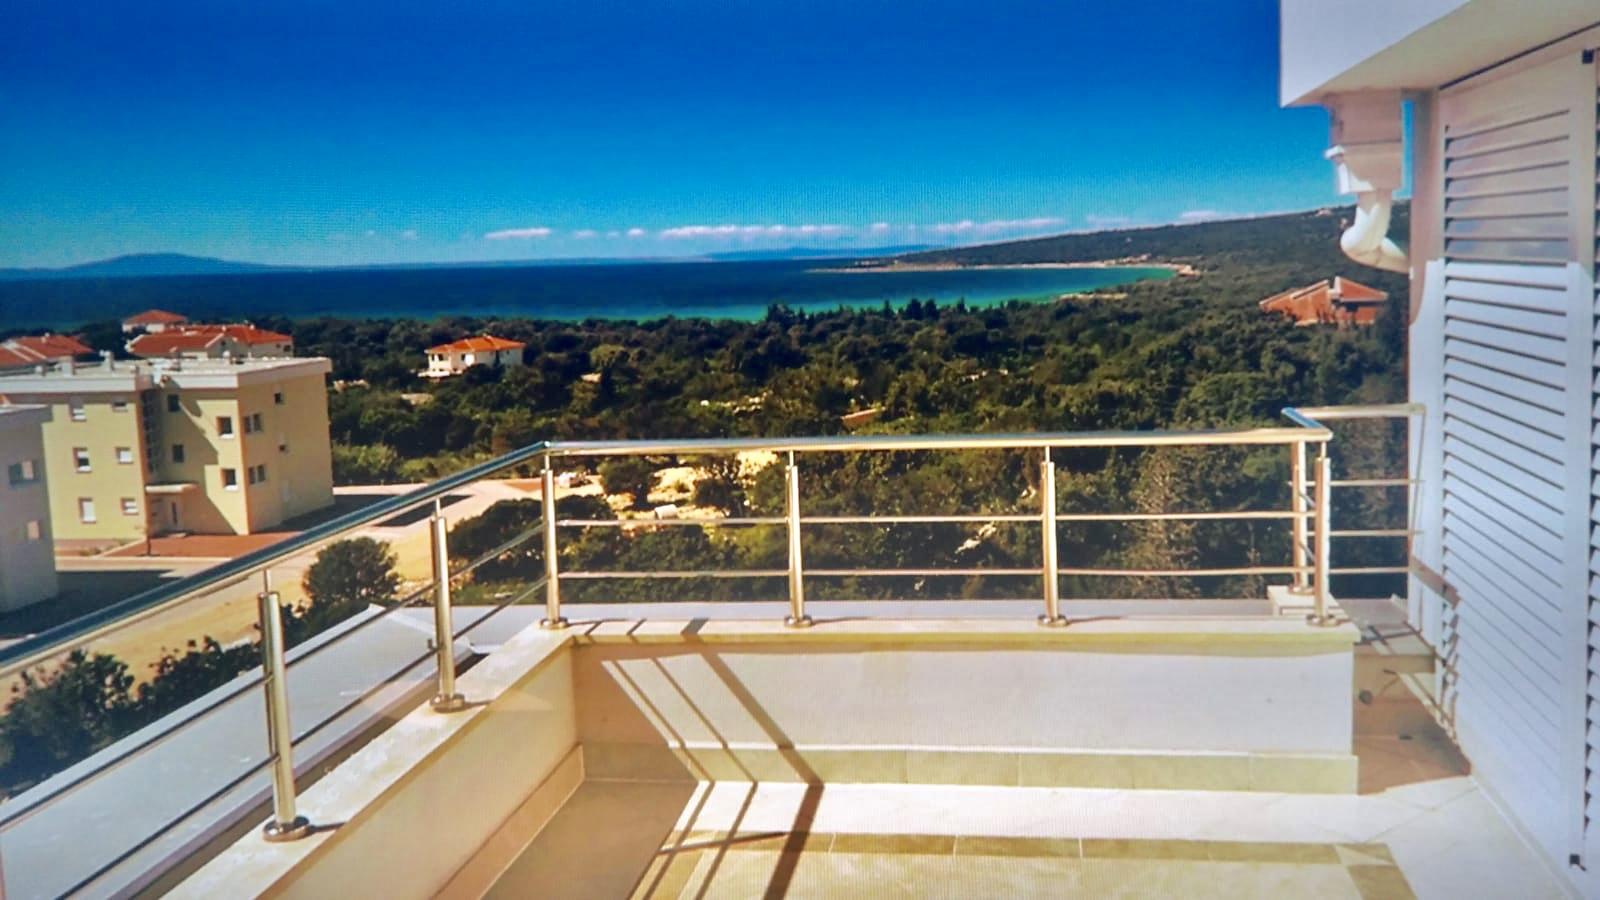 Views from our Ville Sunca top floor Condo